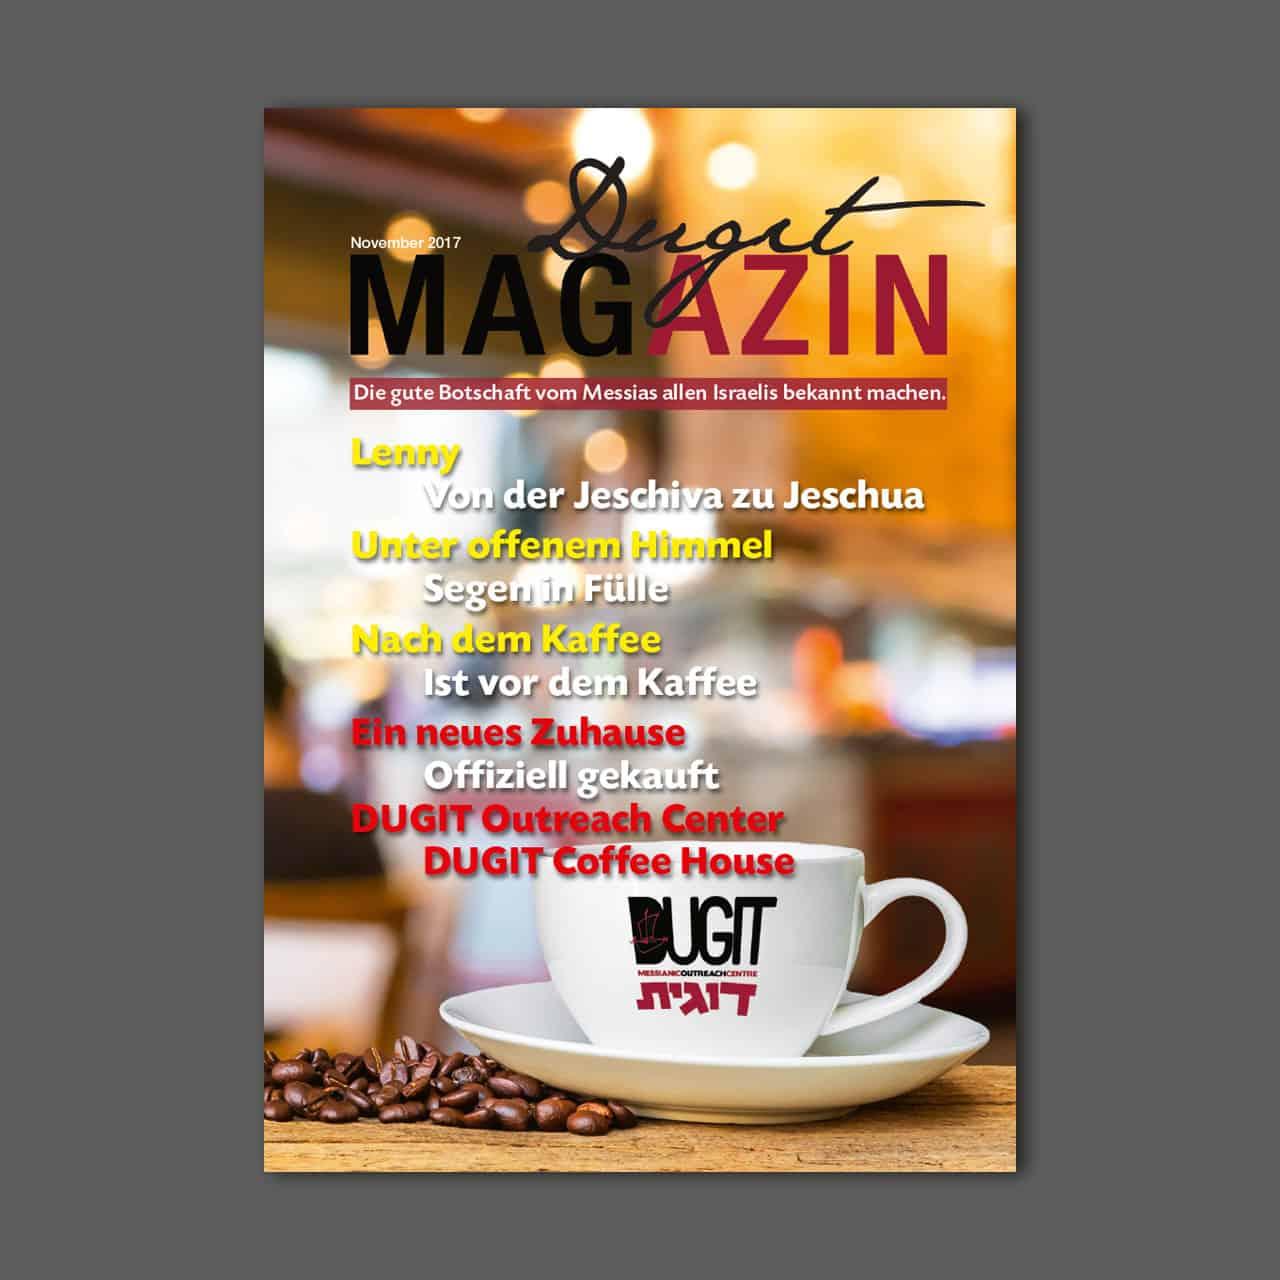 DUGIT-Magazin